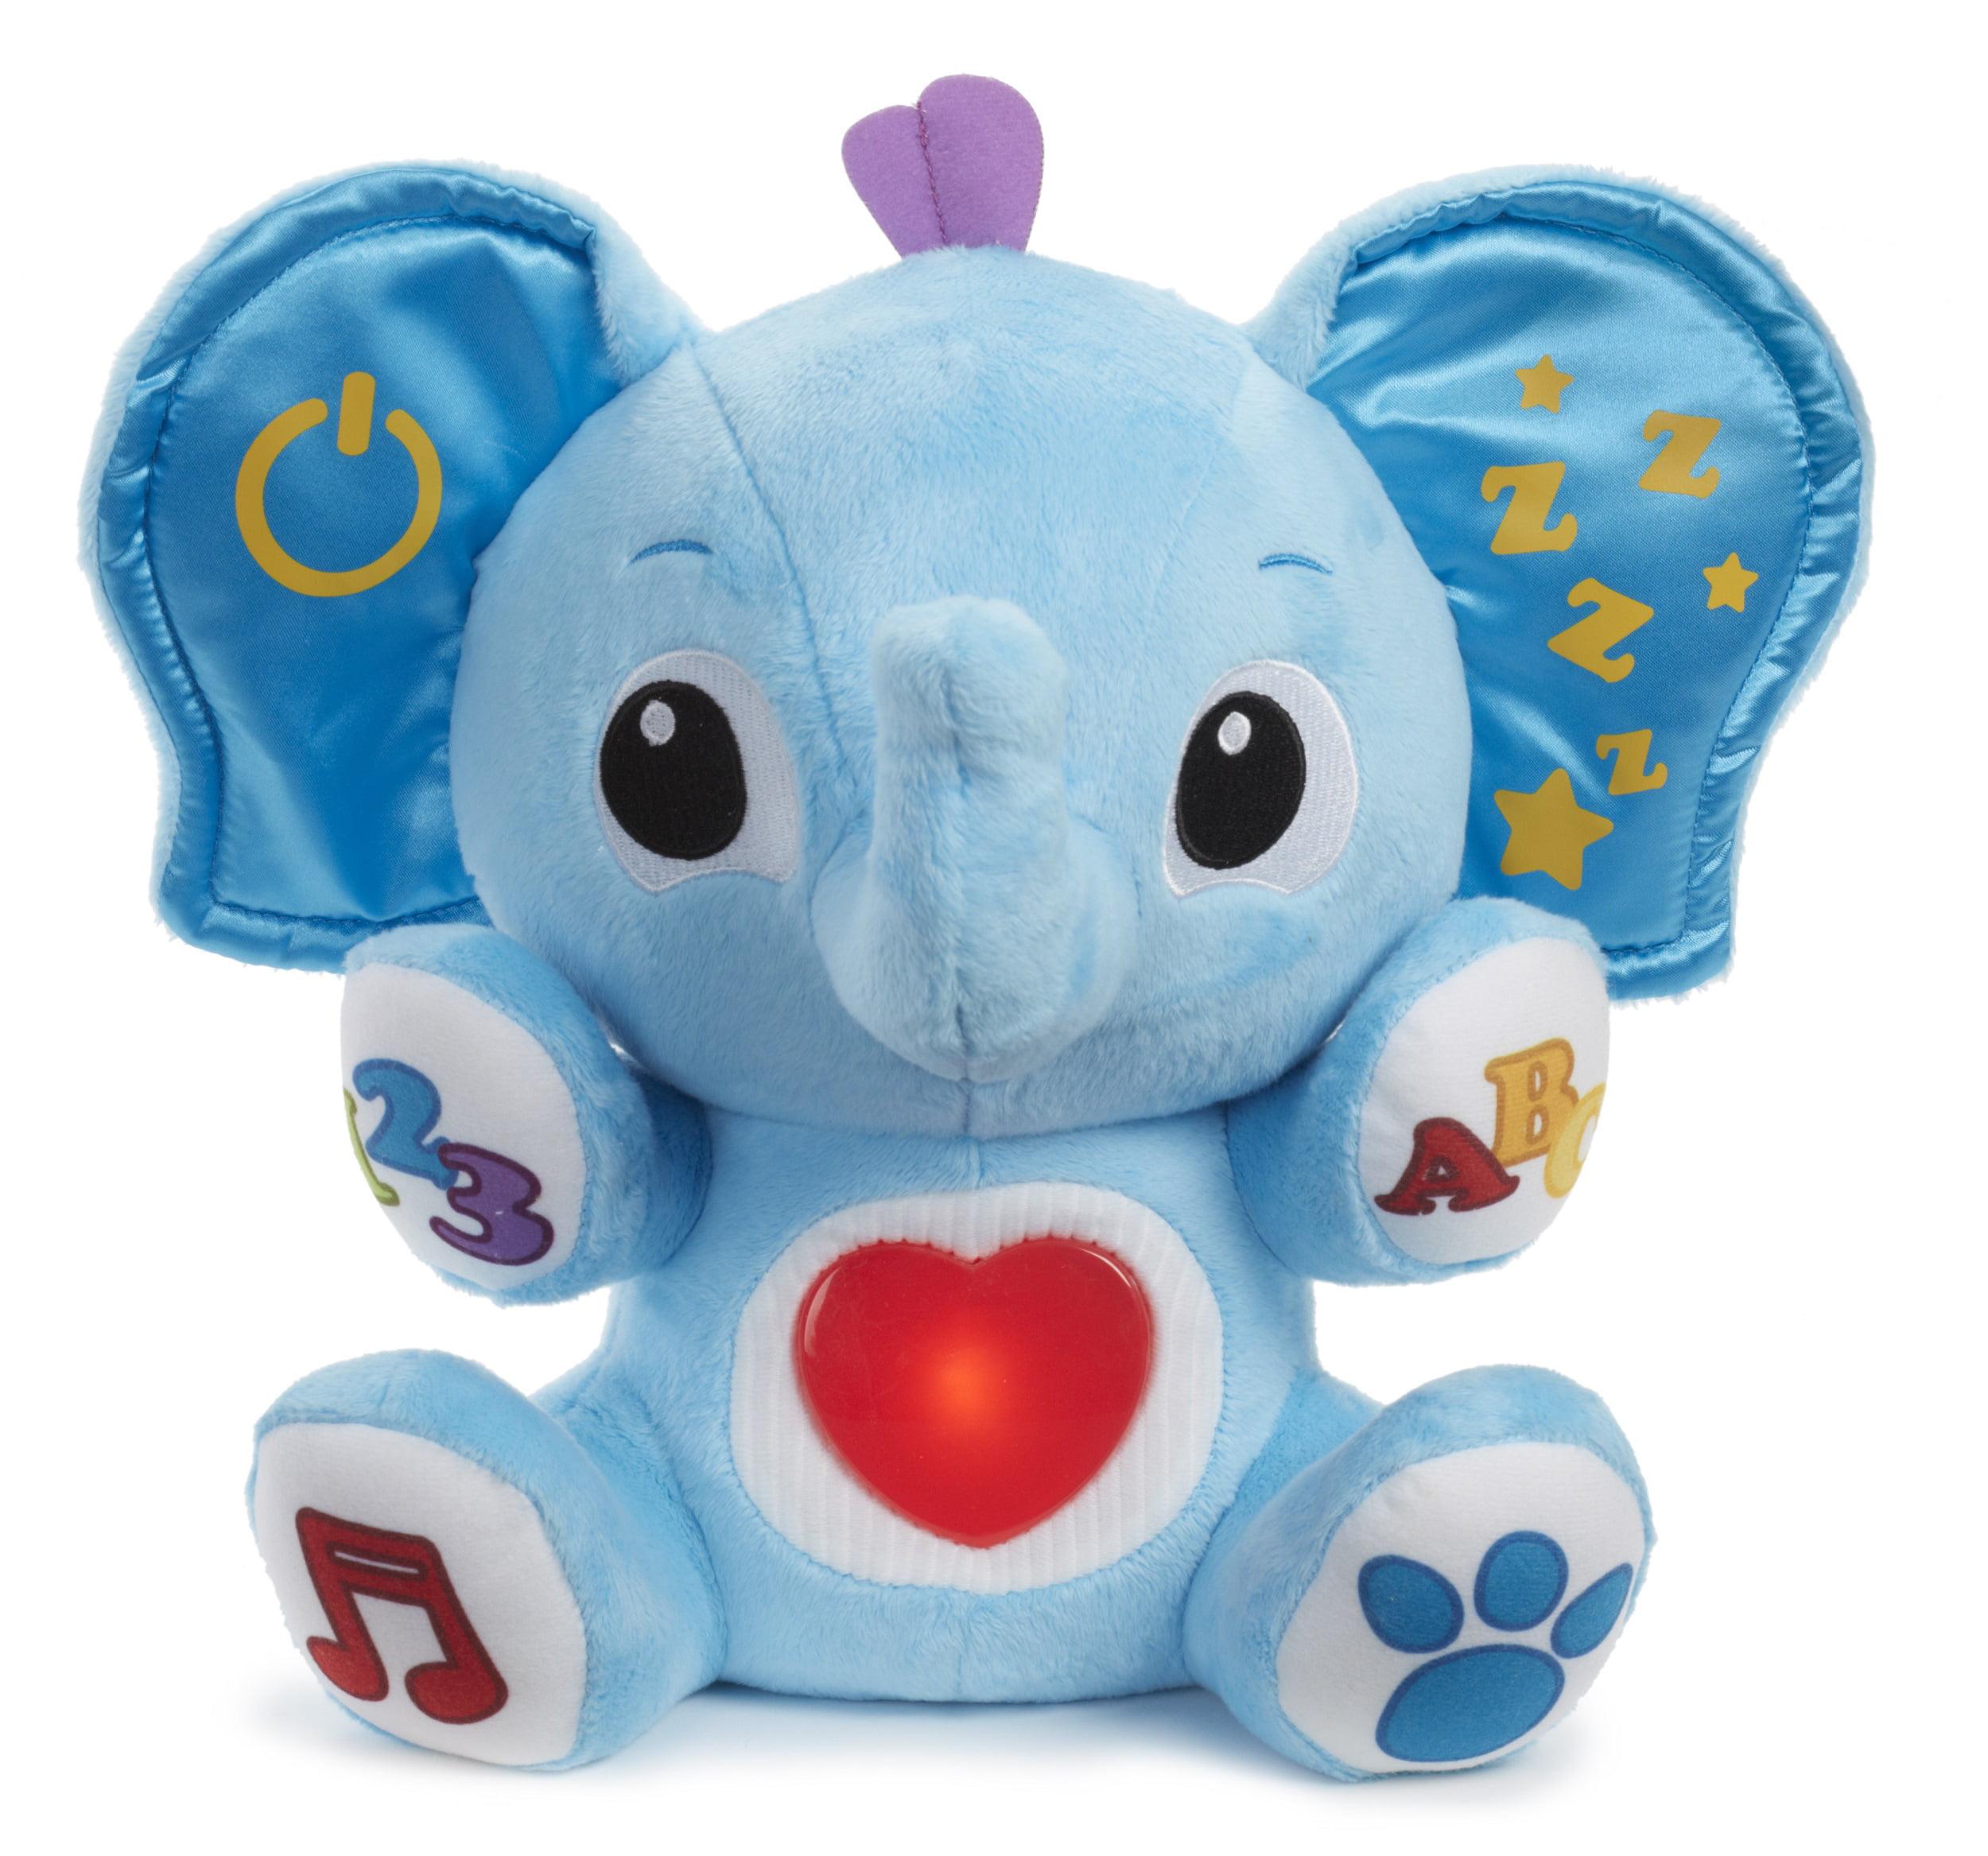 Little Tikes My Buddy- Triumphant Learning Toy, Plush - Walmart.com